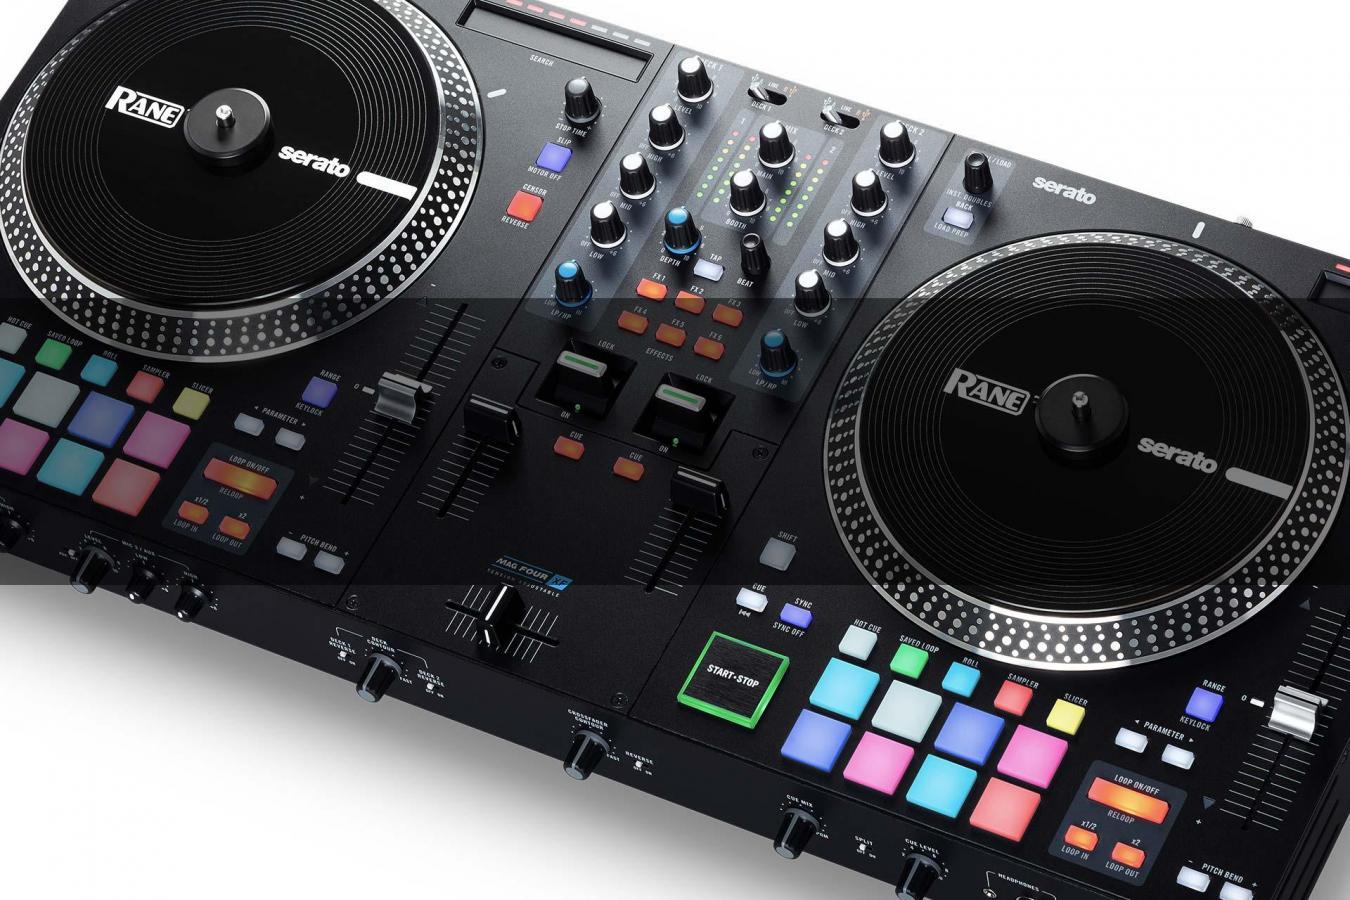 Rene One DJ Controller